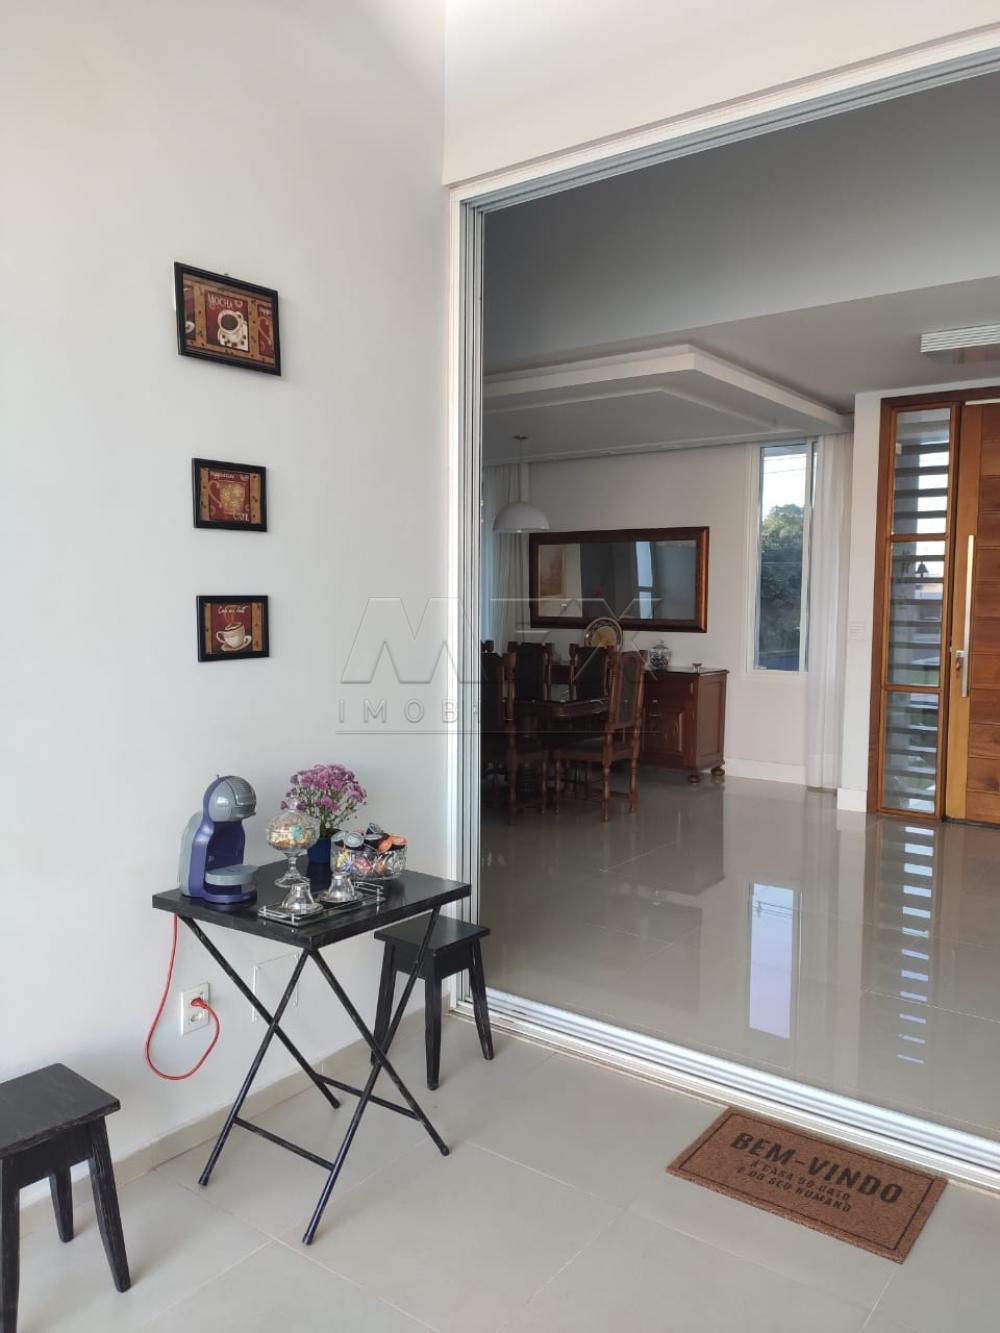 Comprar Casa / Condomínio em Bauru apenas R$ 1.800.000,00 - Foto 10